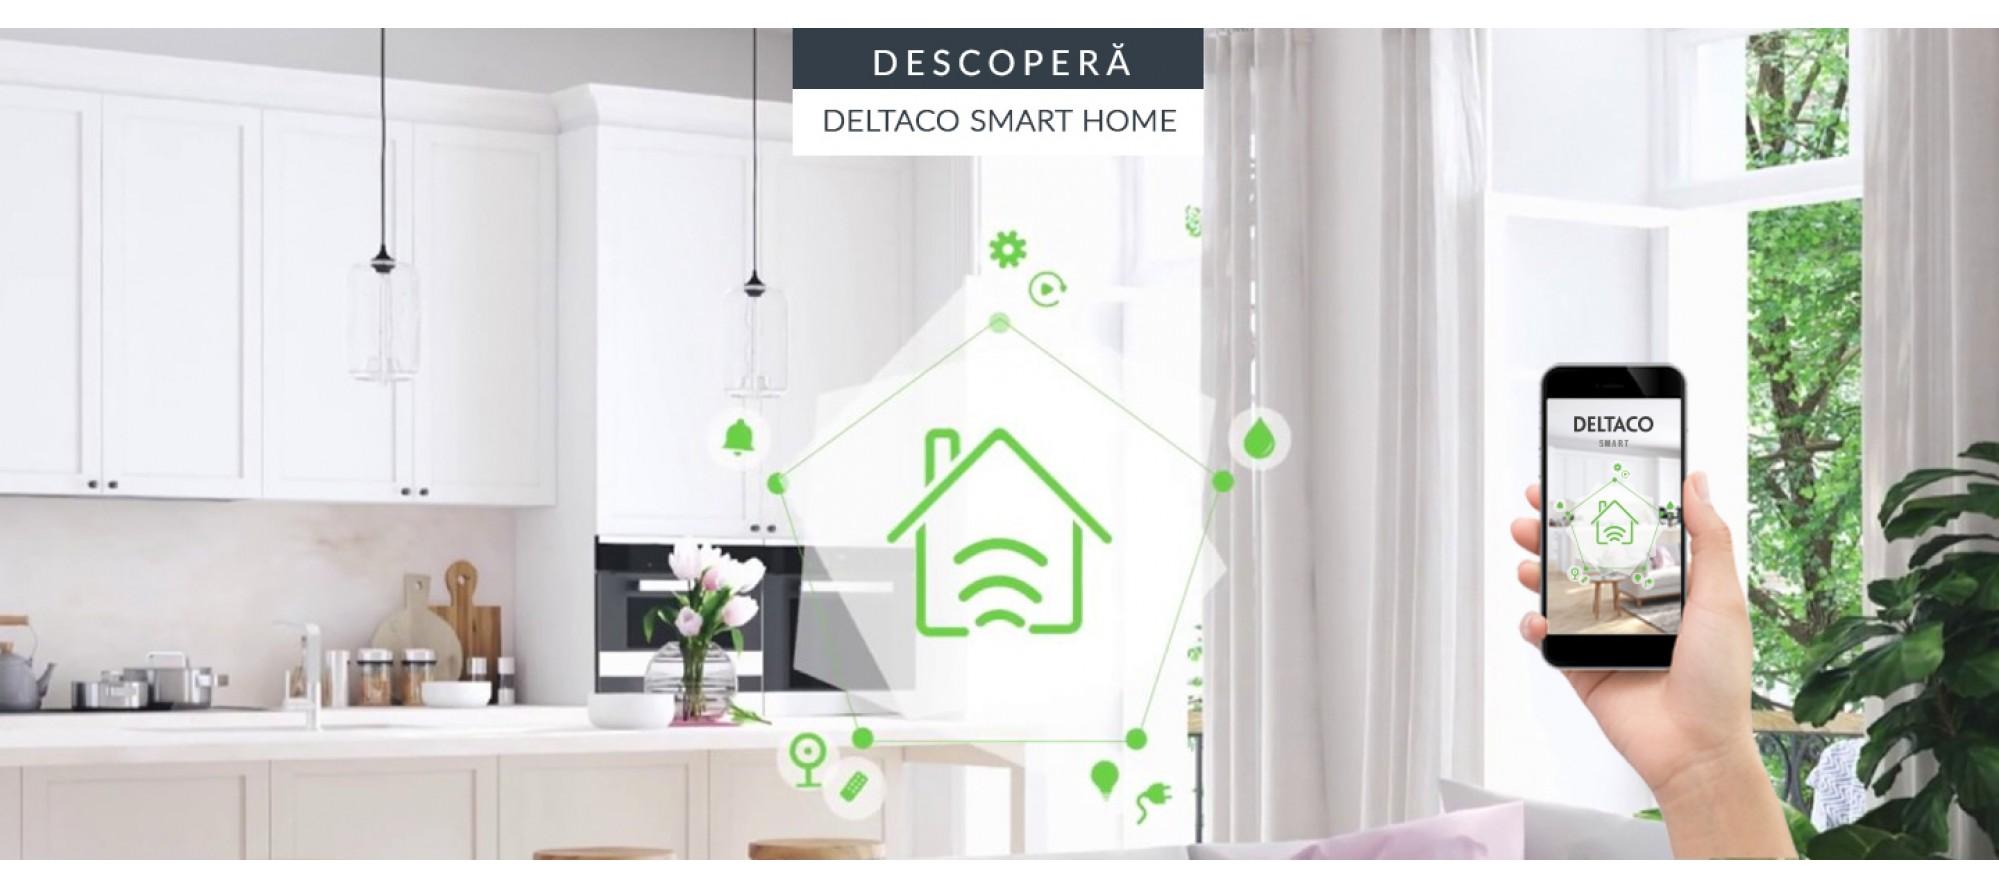 deltaco-smart-home